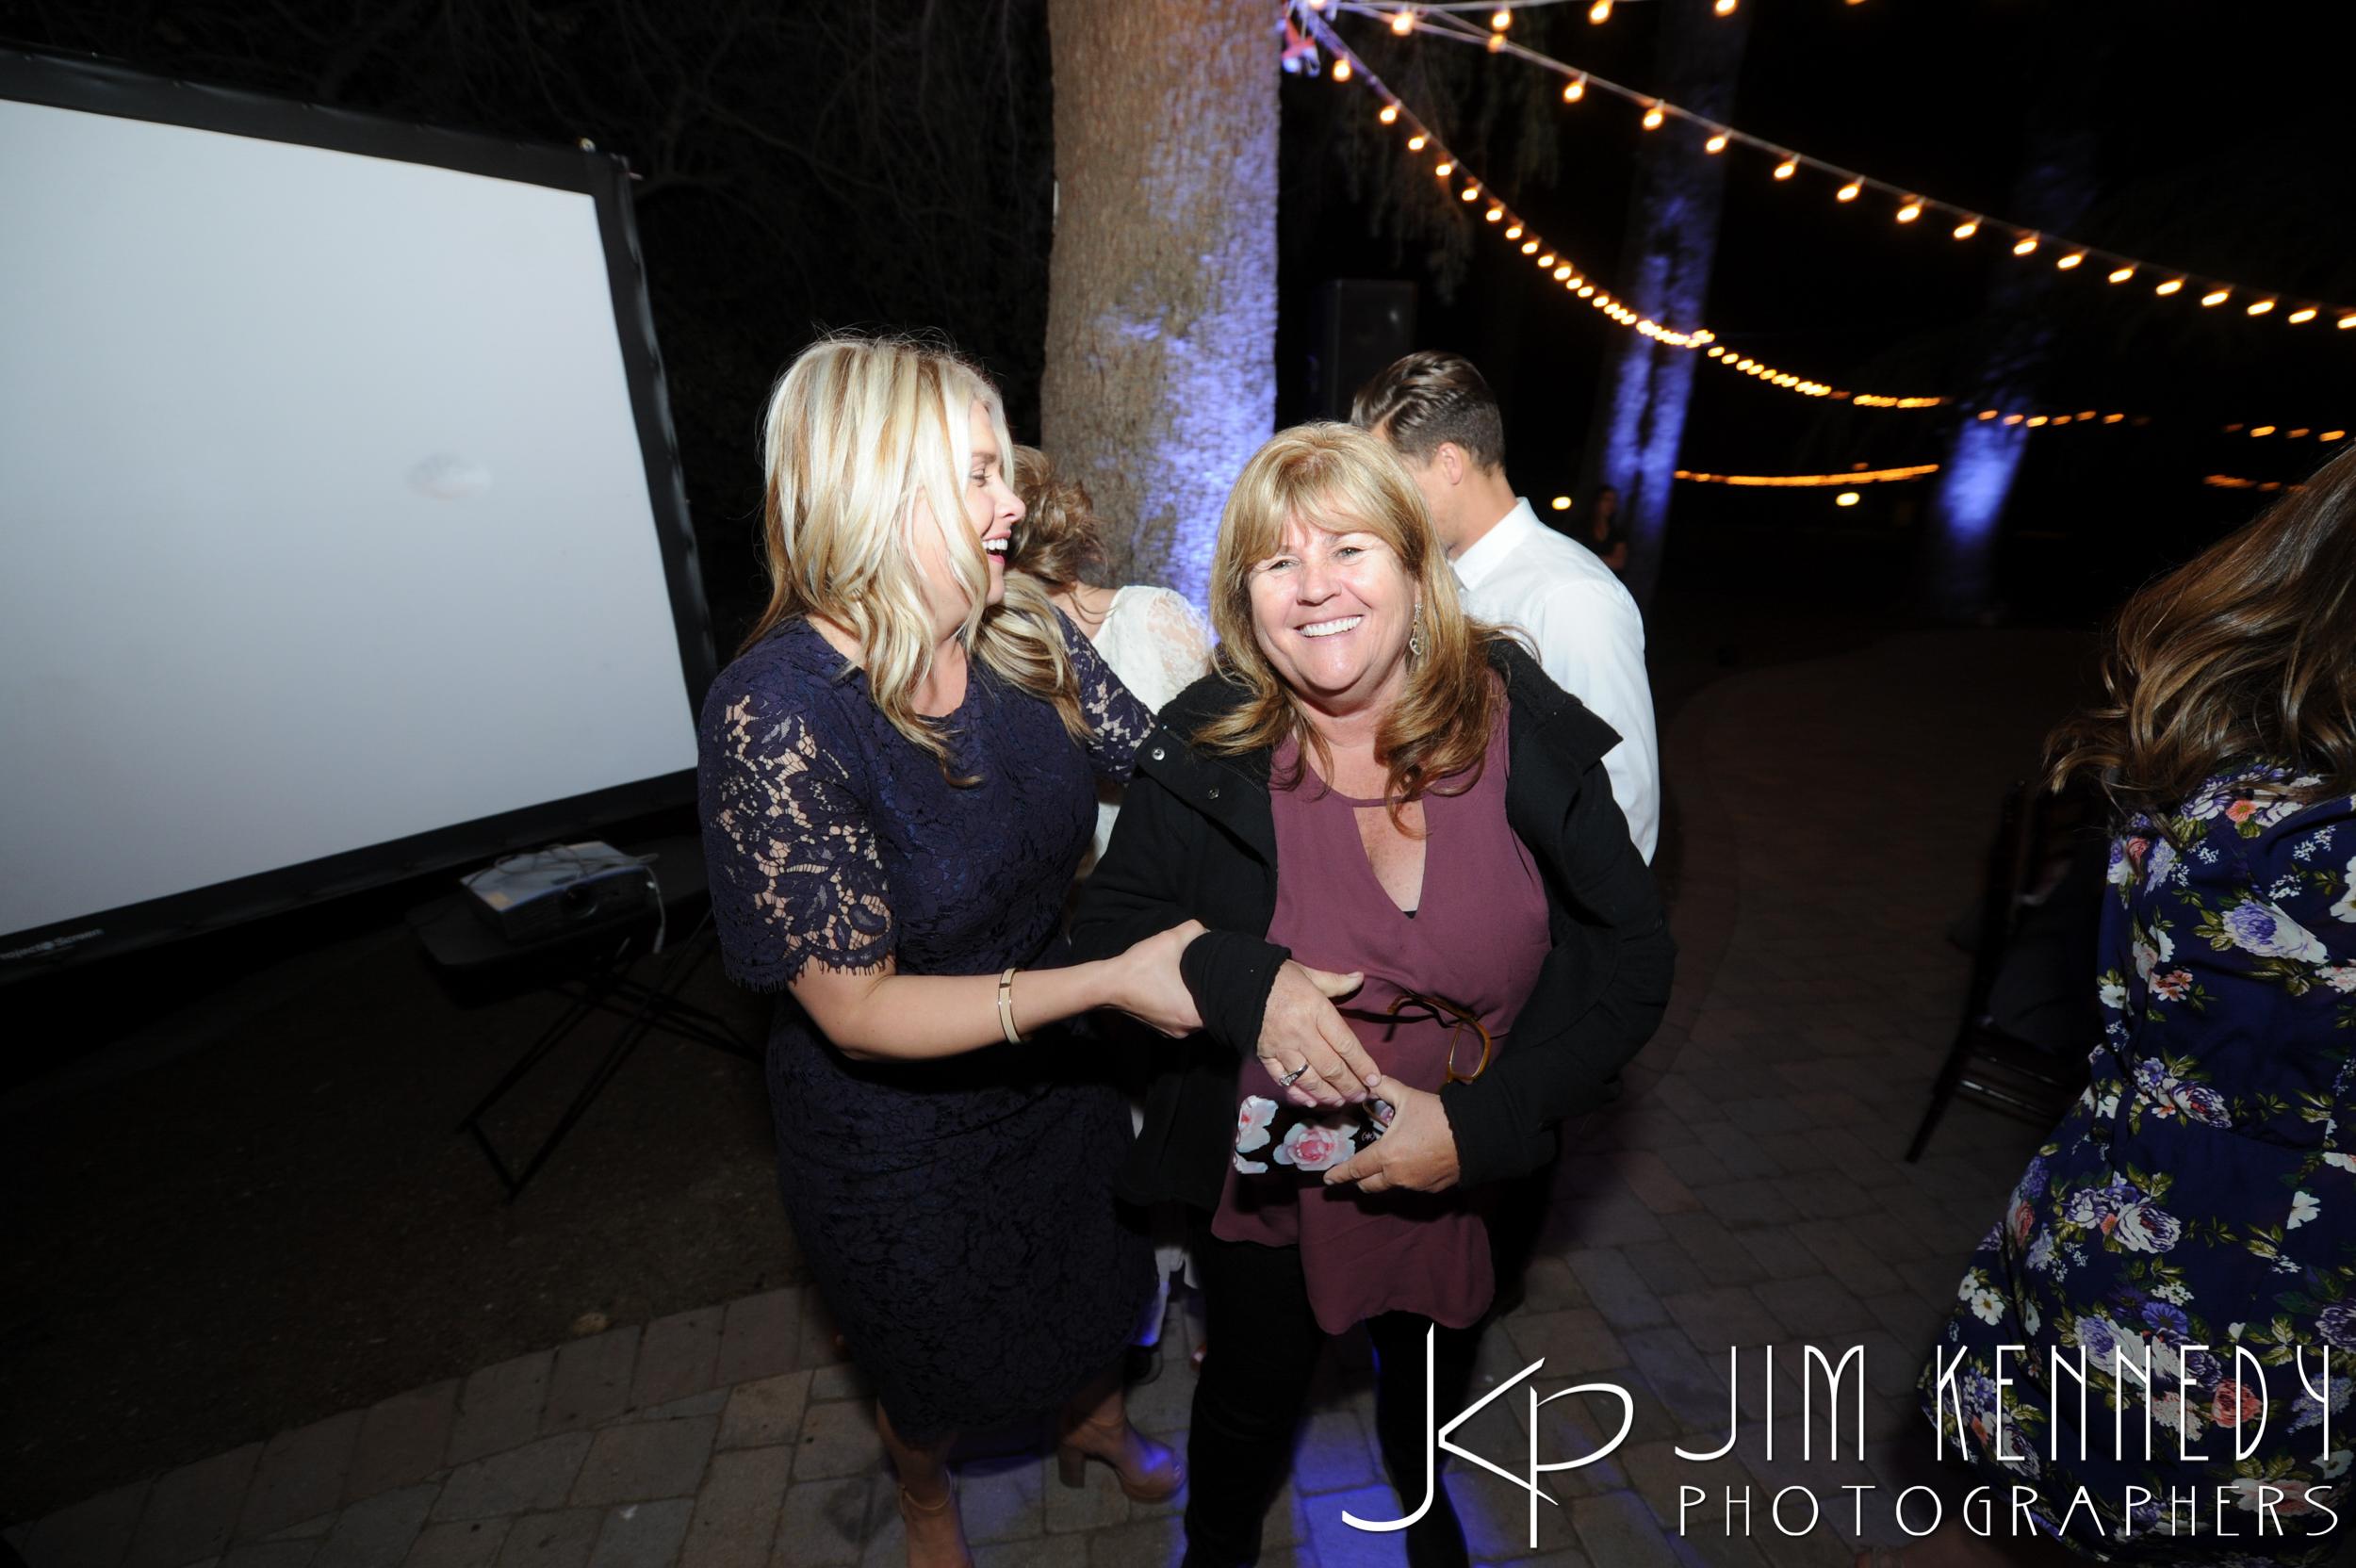 jim_kennedy_photographers_highland_springs_wedding_caitlyn_0214.jpg